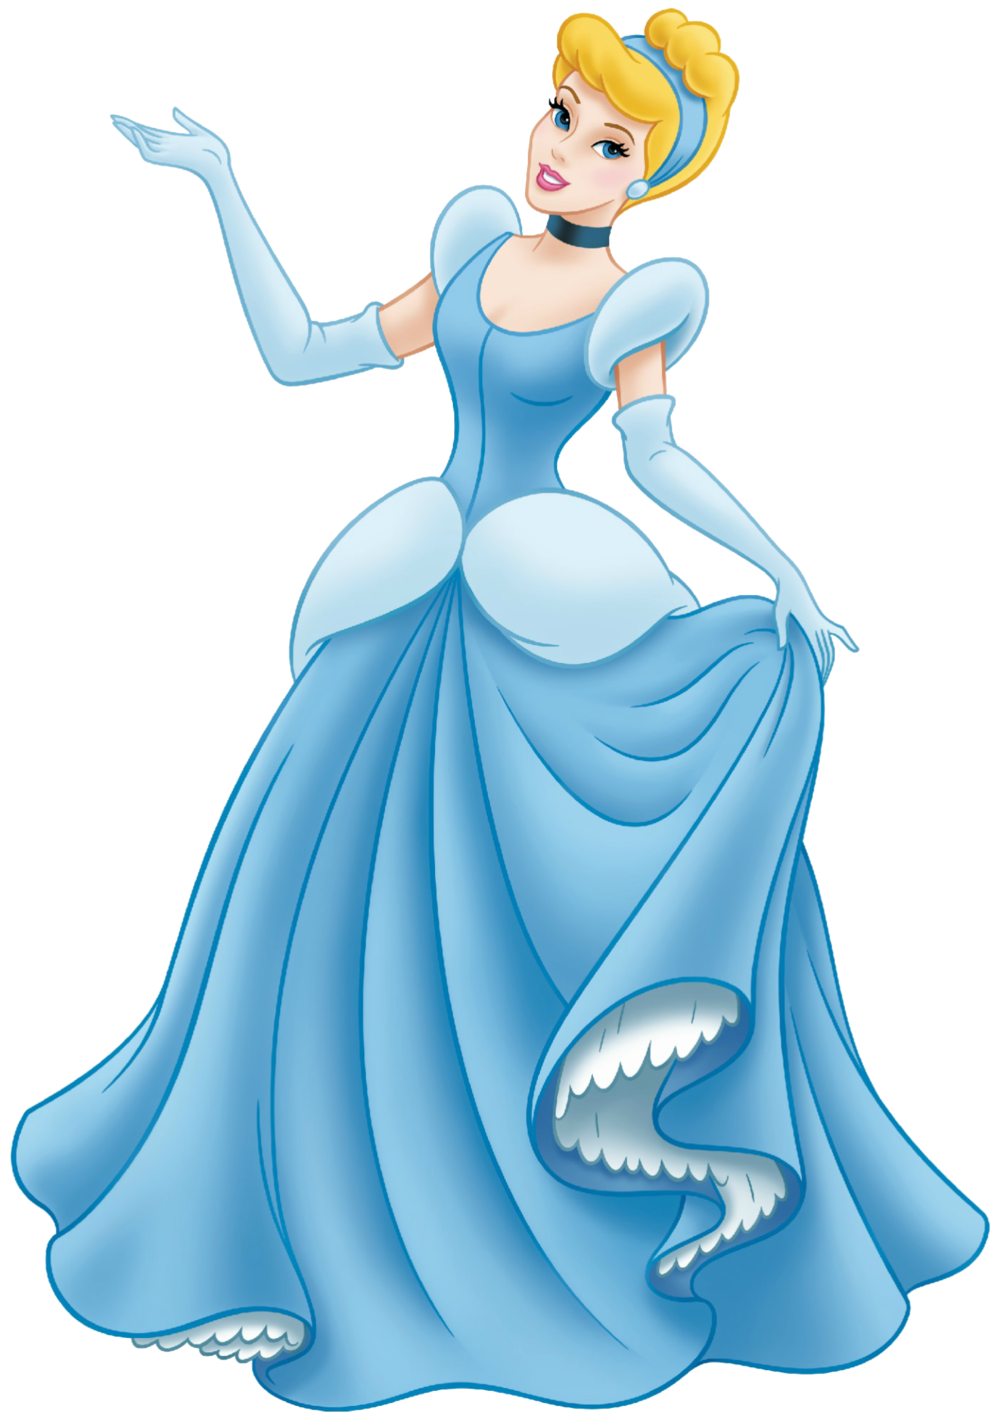 Cinderella Gallery Disney Wiki Fandom Powered By Wikia Cinderella Disney Disney Princess Drawings Cinderella Cartoon